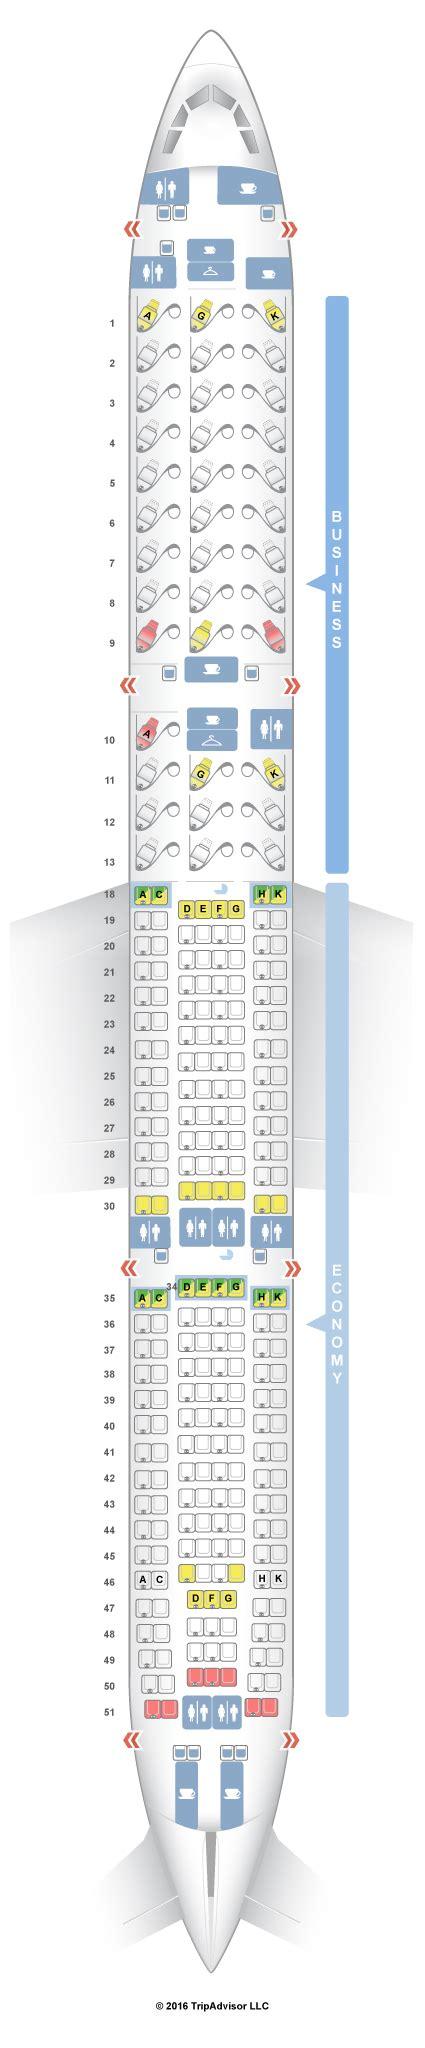 seatguru seat map air canada airbus a330 300 333 v1